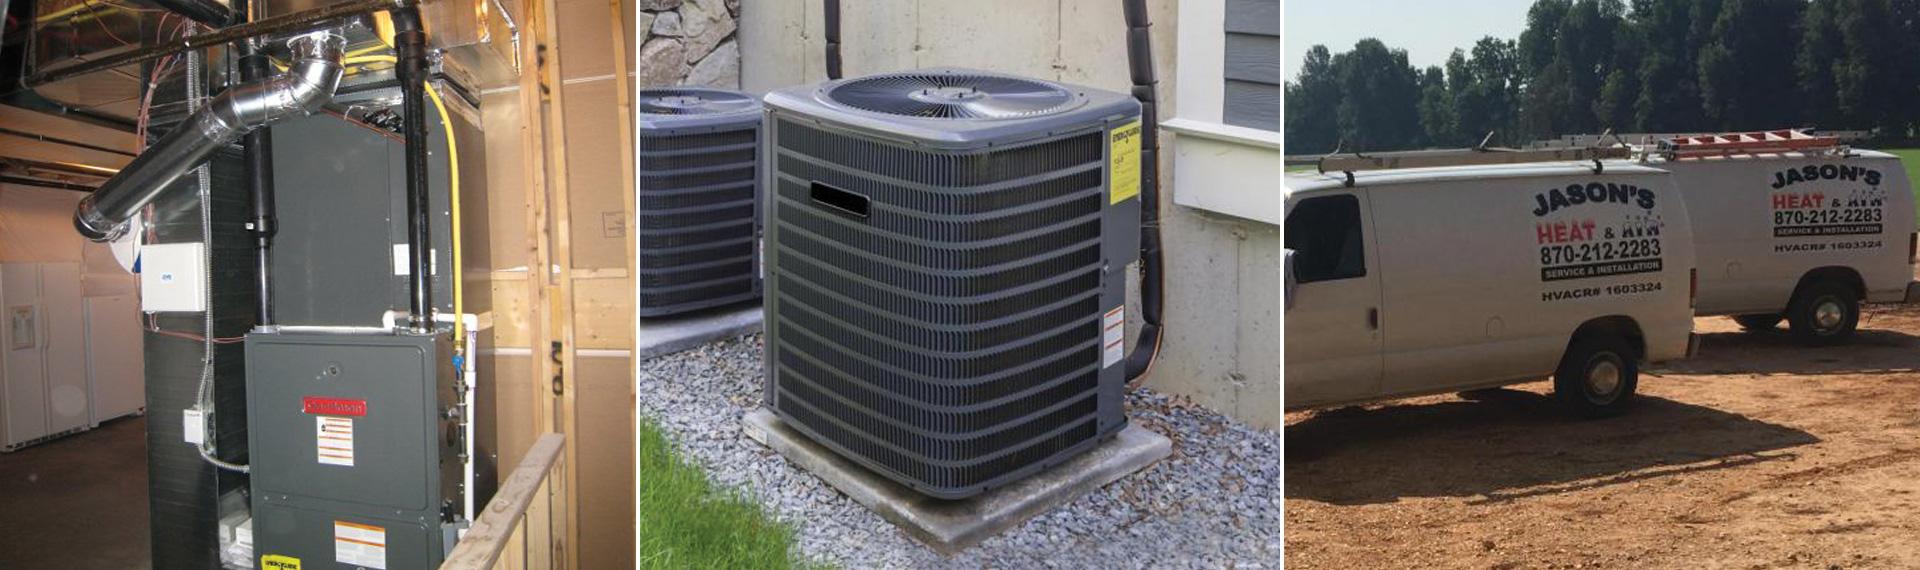 Jason's Heat & Air Corning AR